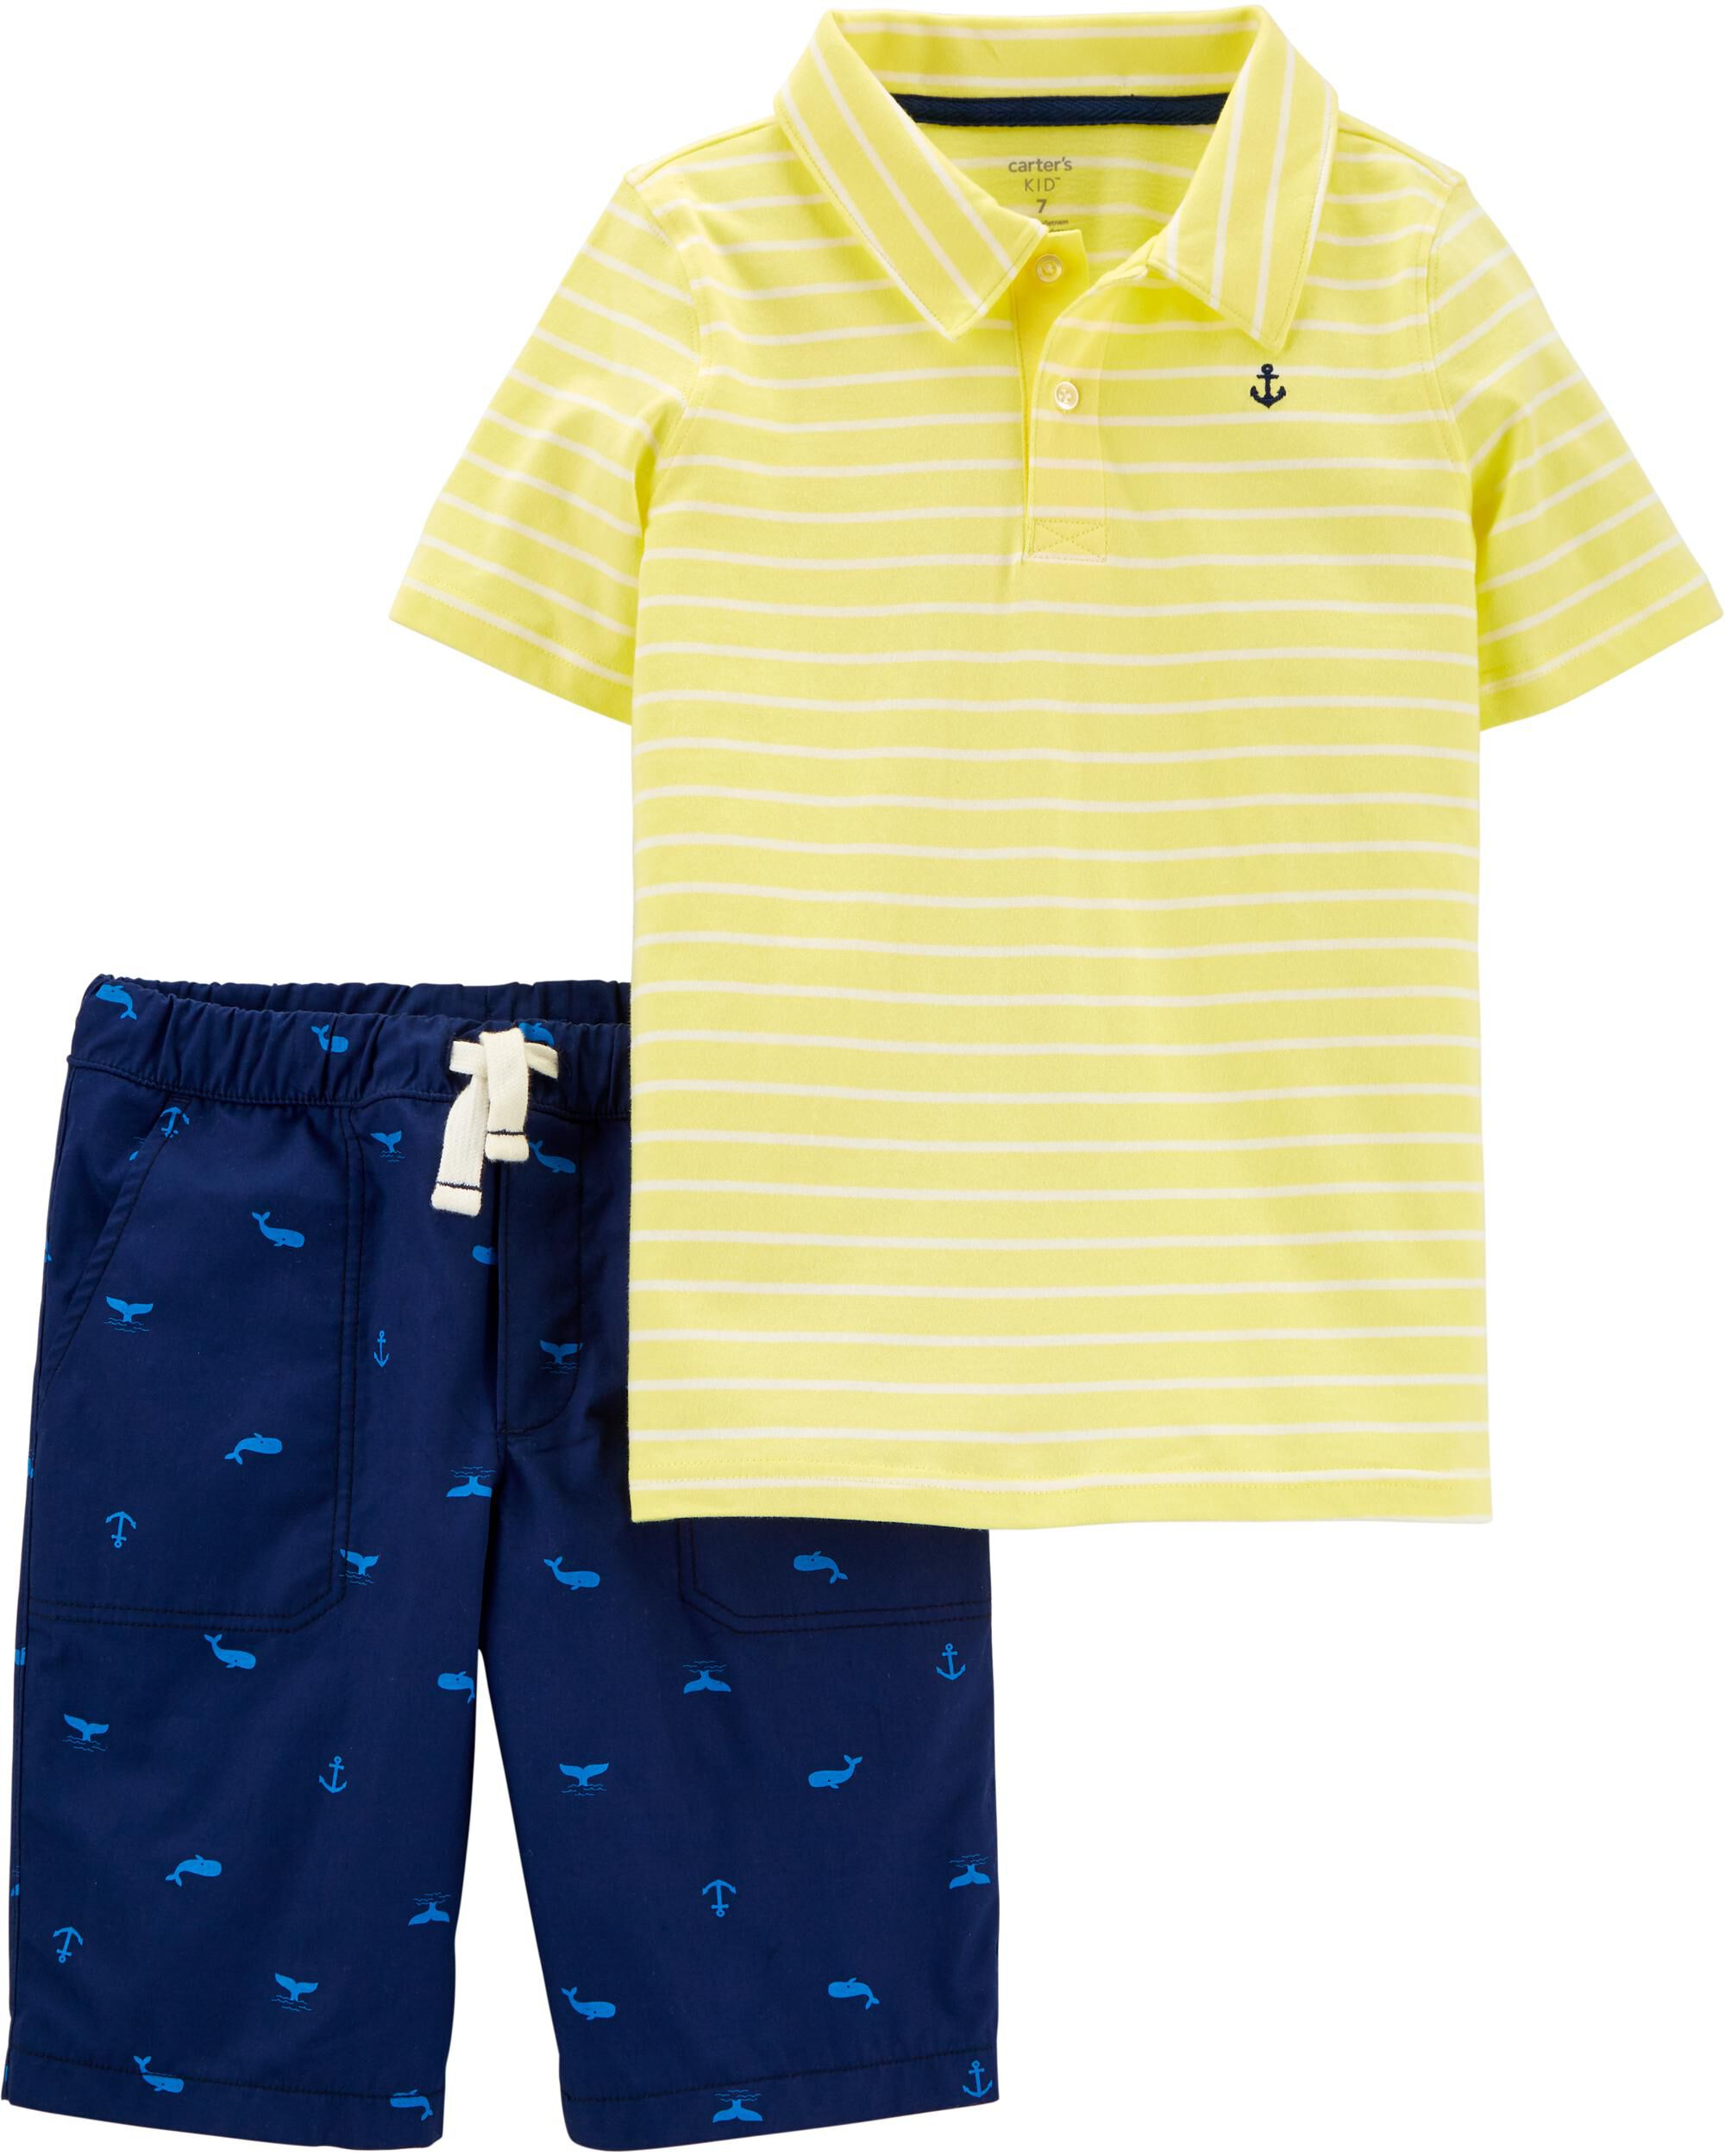 2-Piece Striped Polo & Whale Short Set